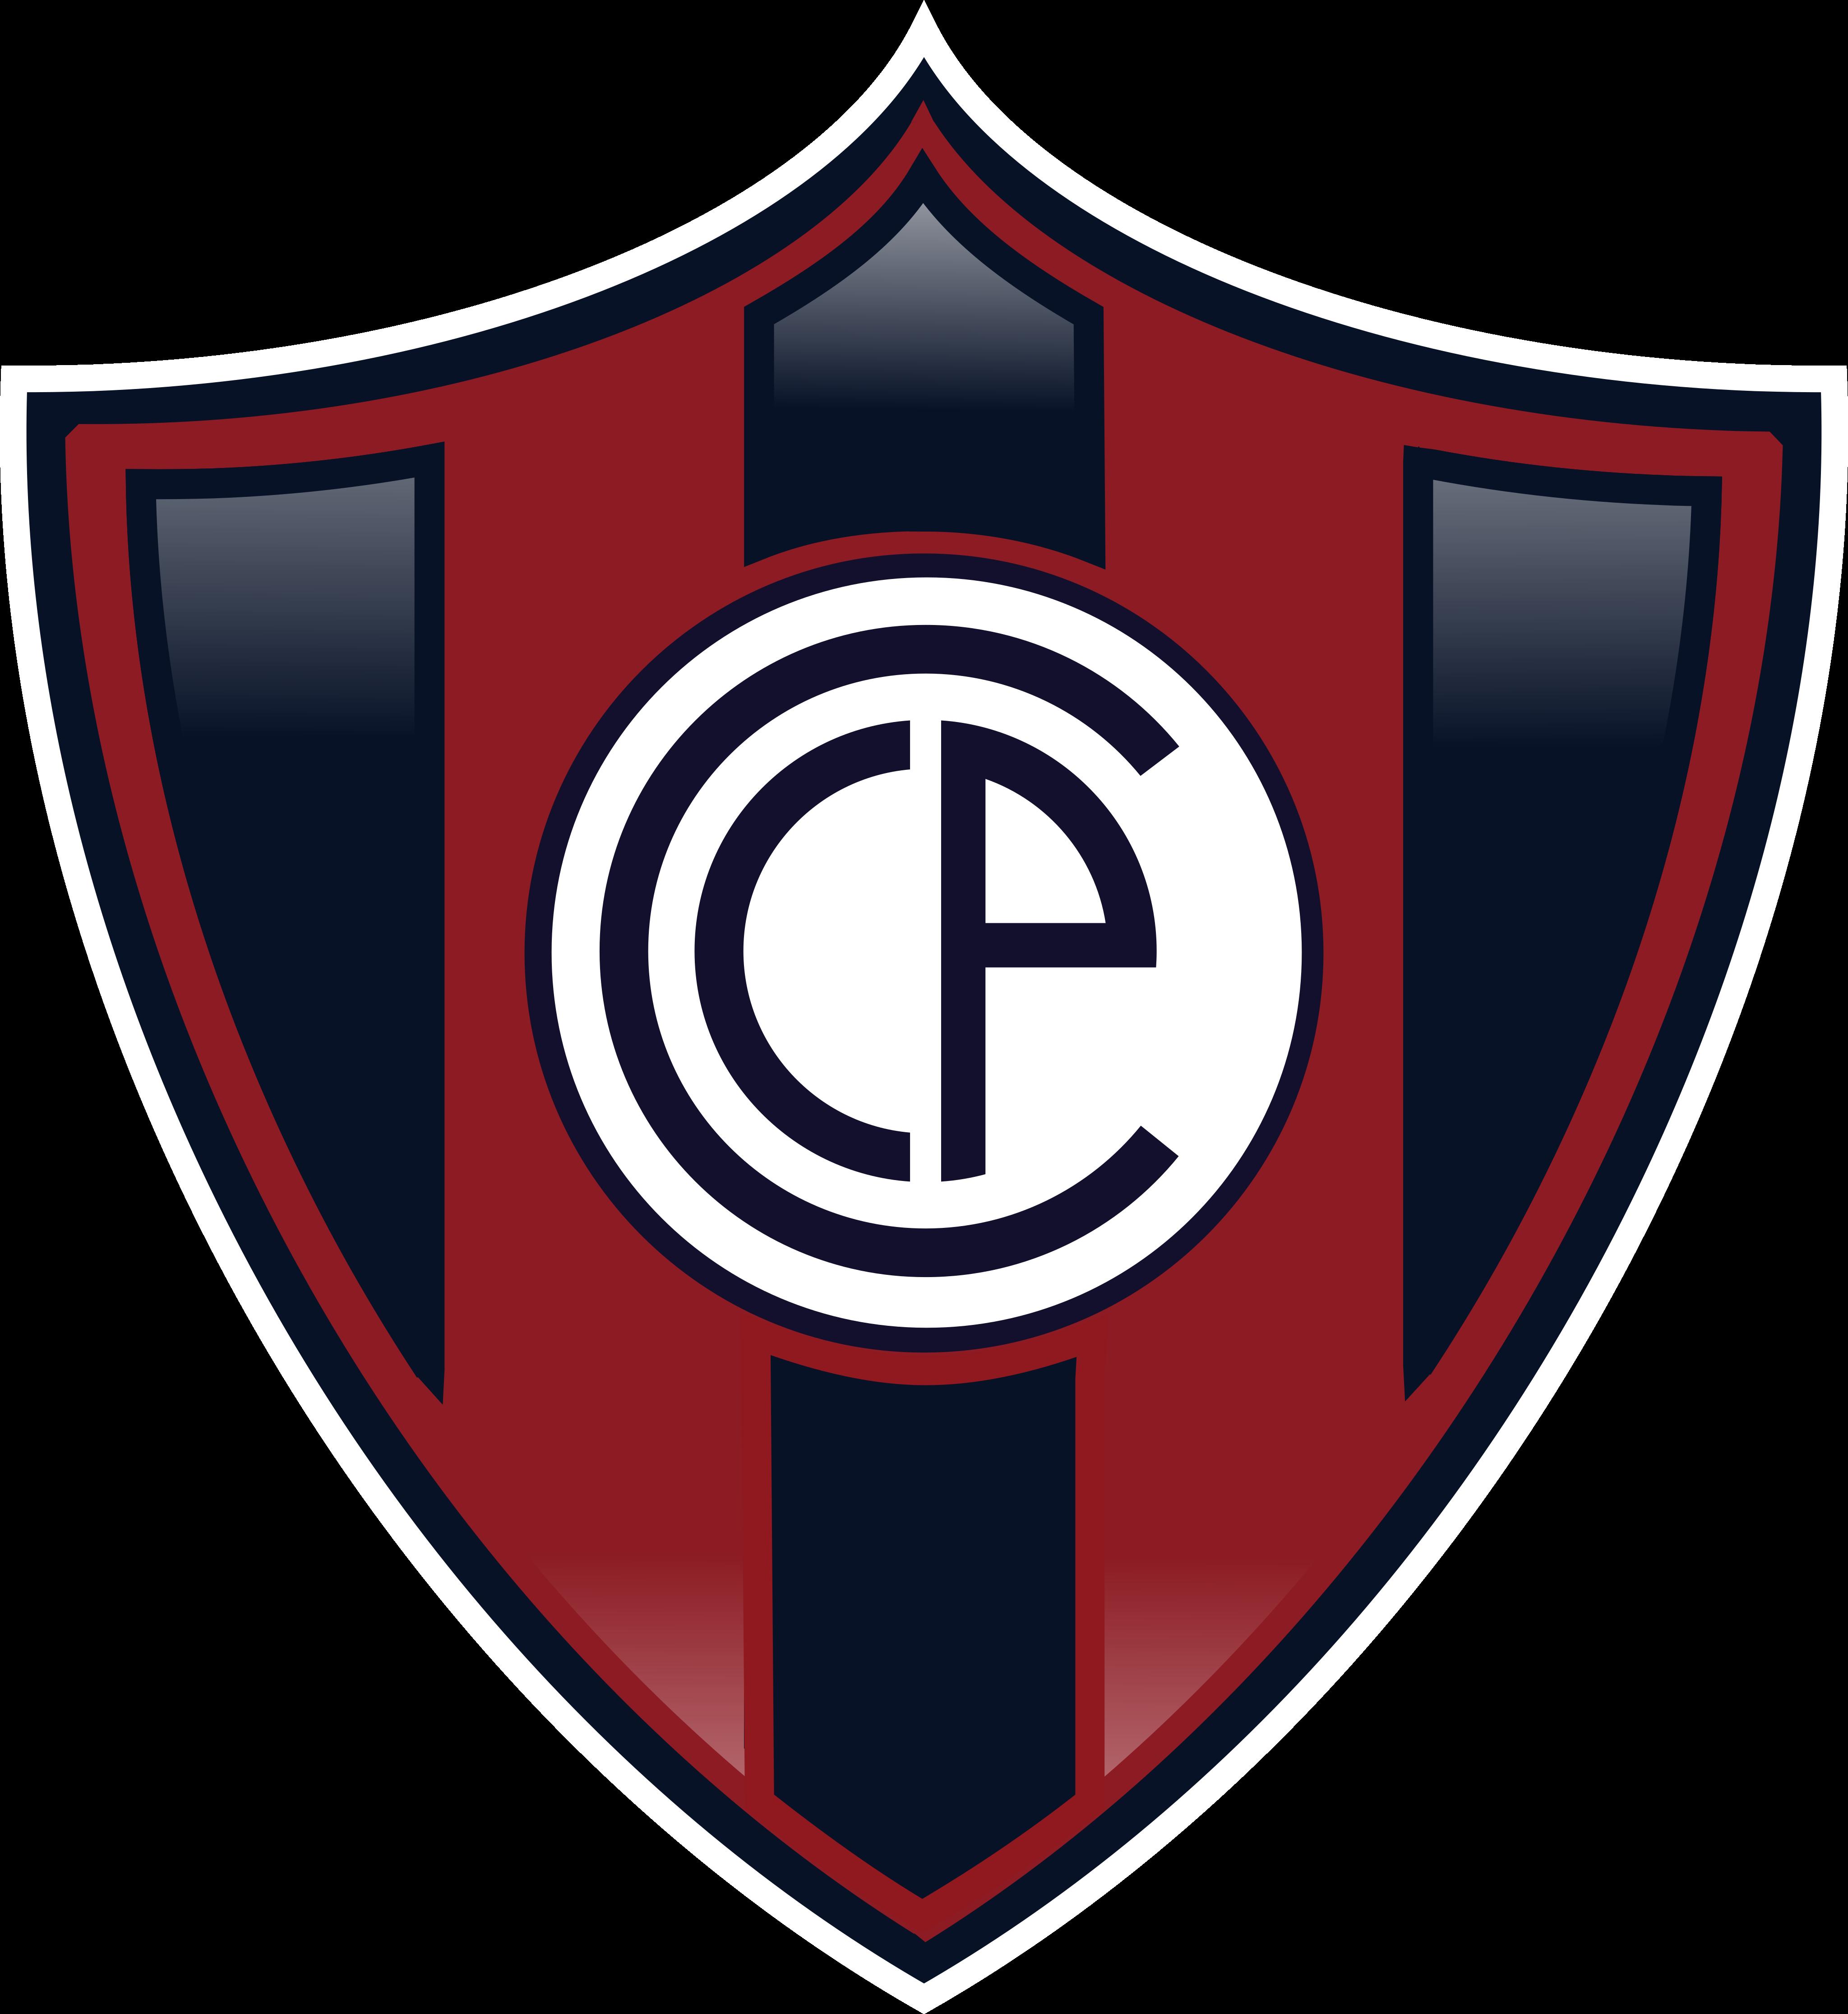 cerro porteno logo 8 - Cerro Porteño Logo - Escudo